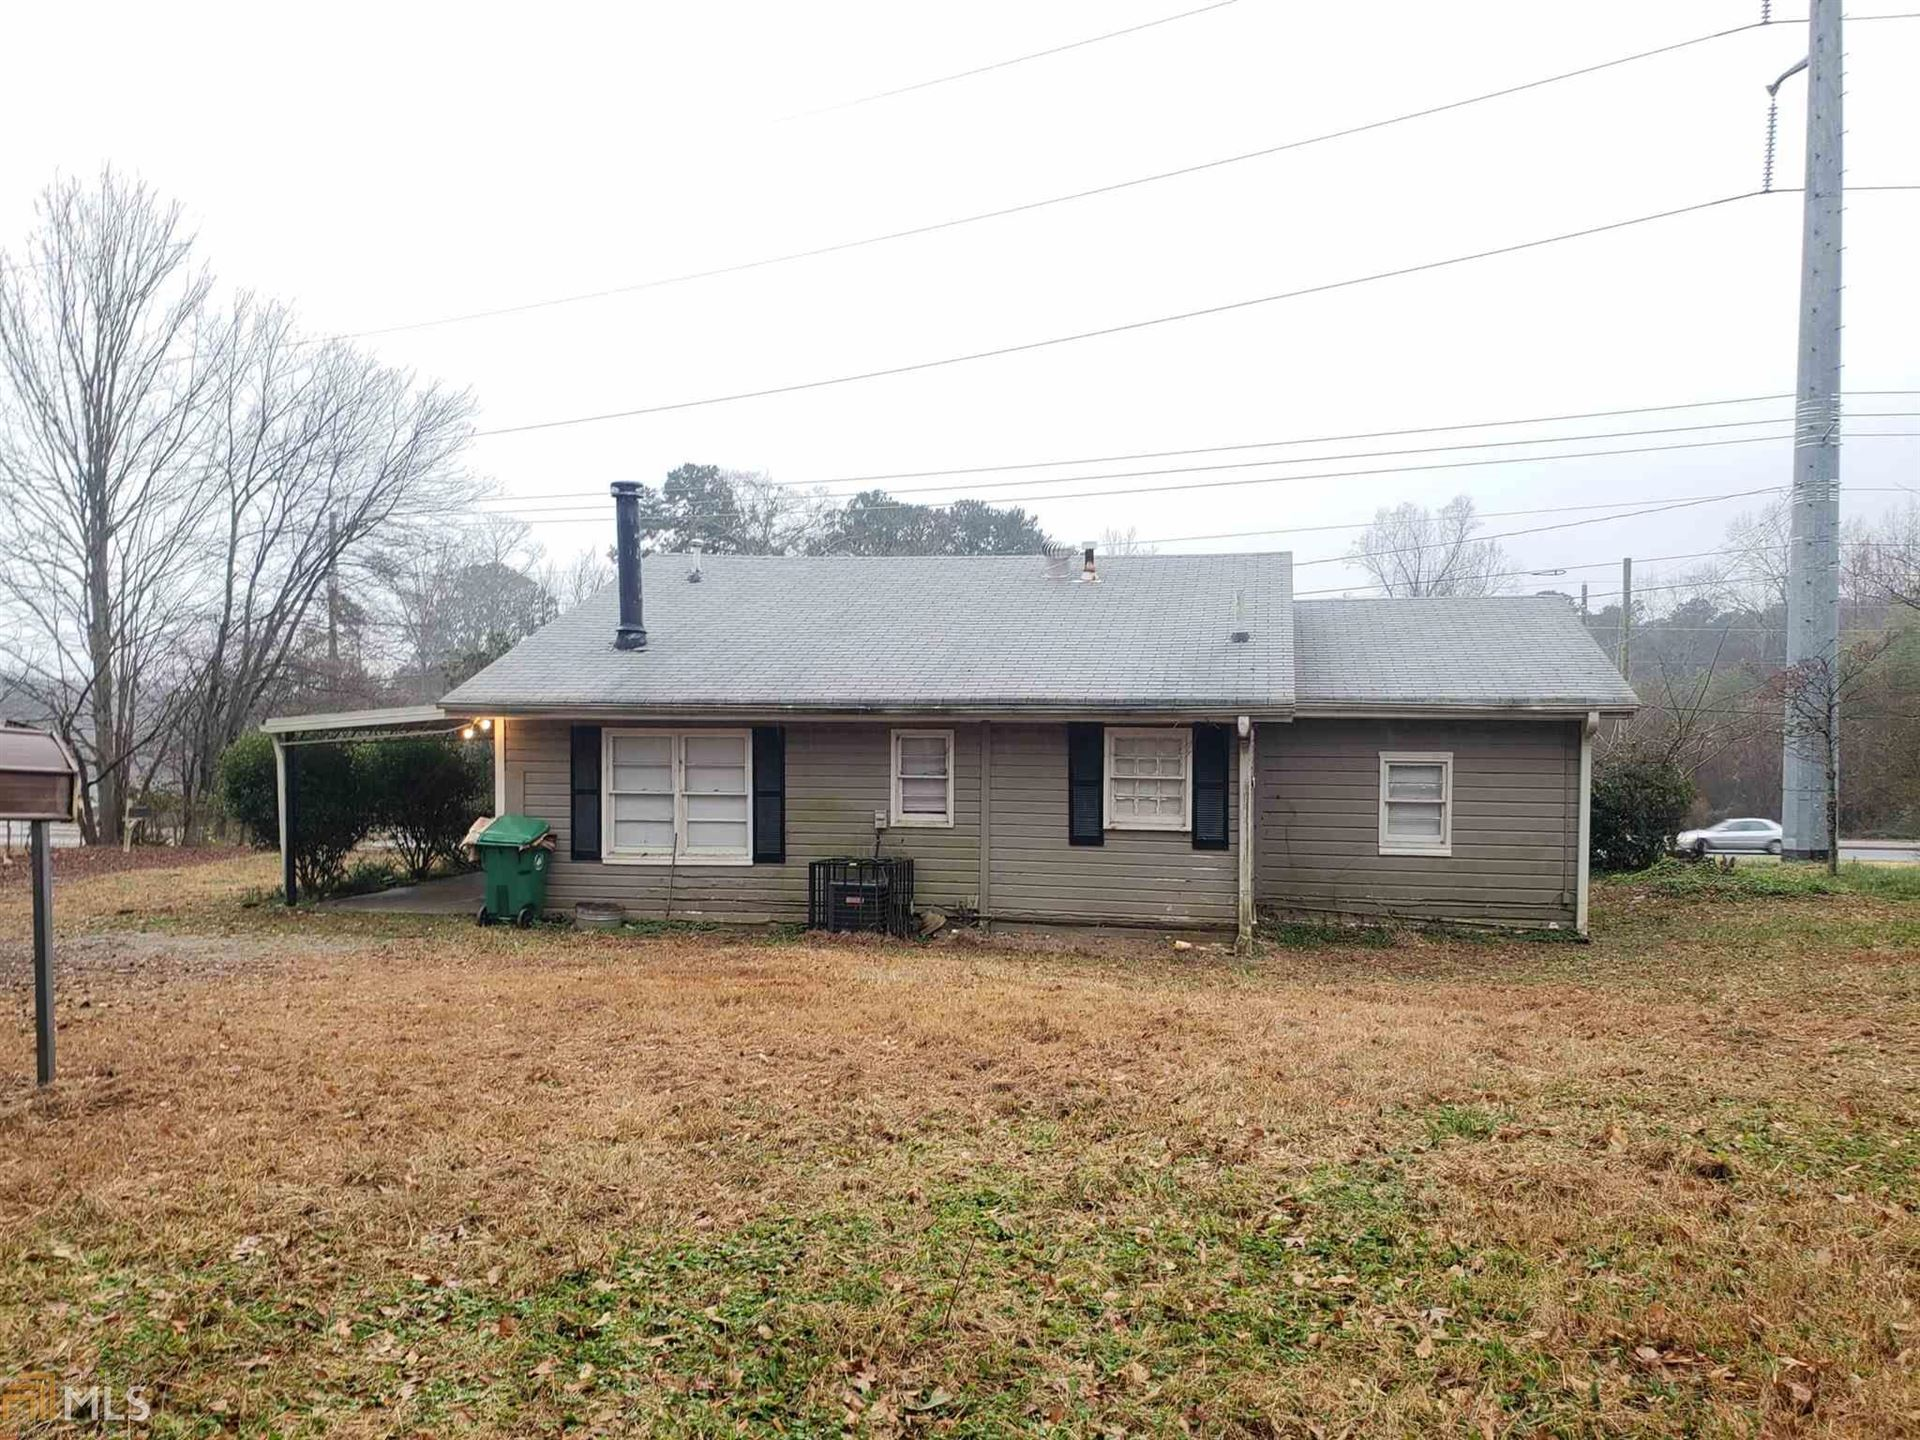 2672 Snapfinger Rd, Decatur, GA 30034 - #: 8909953